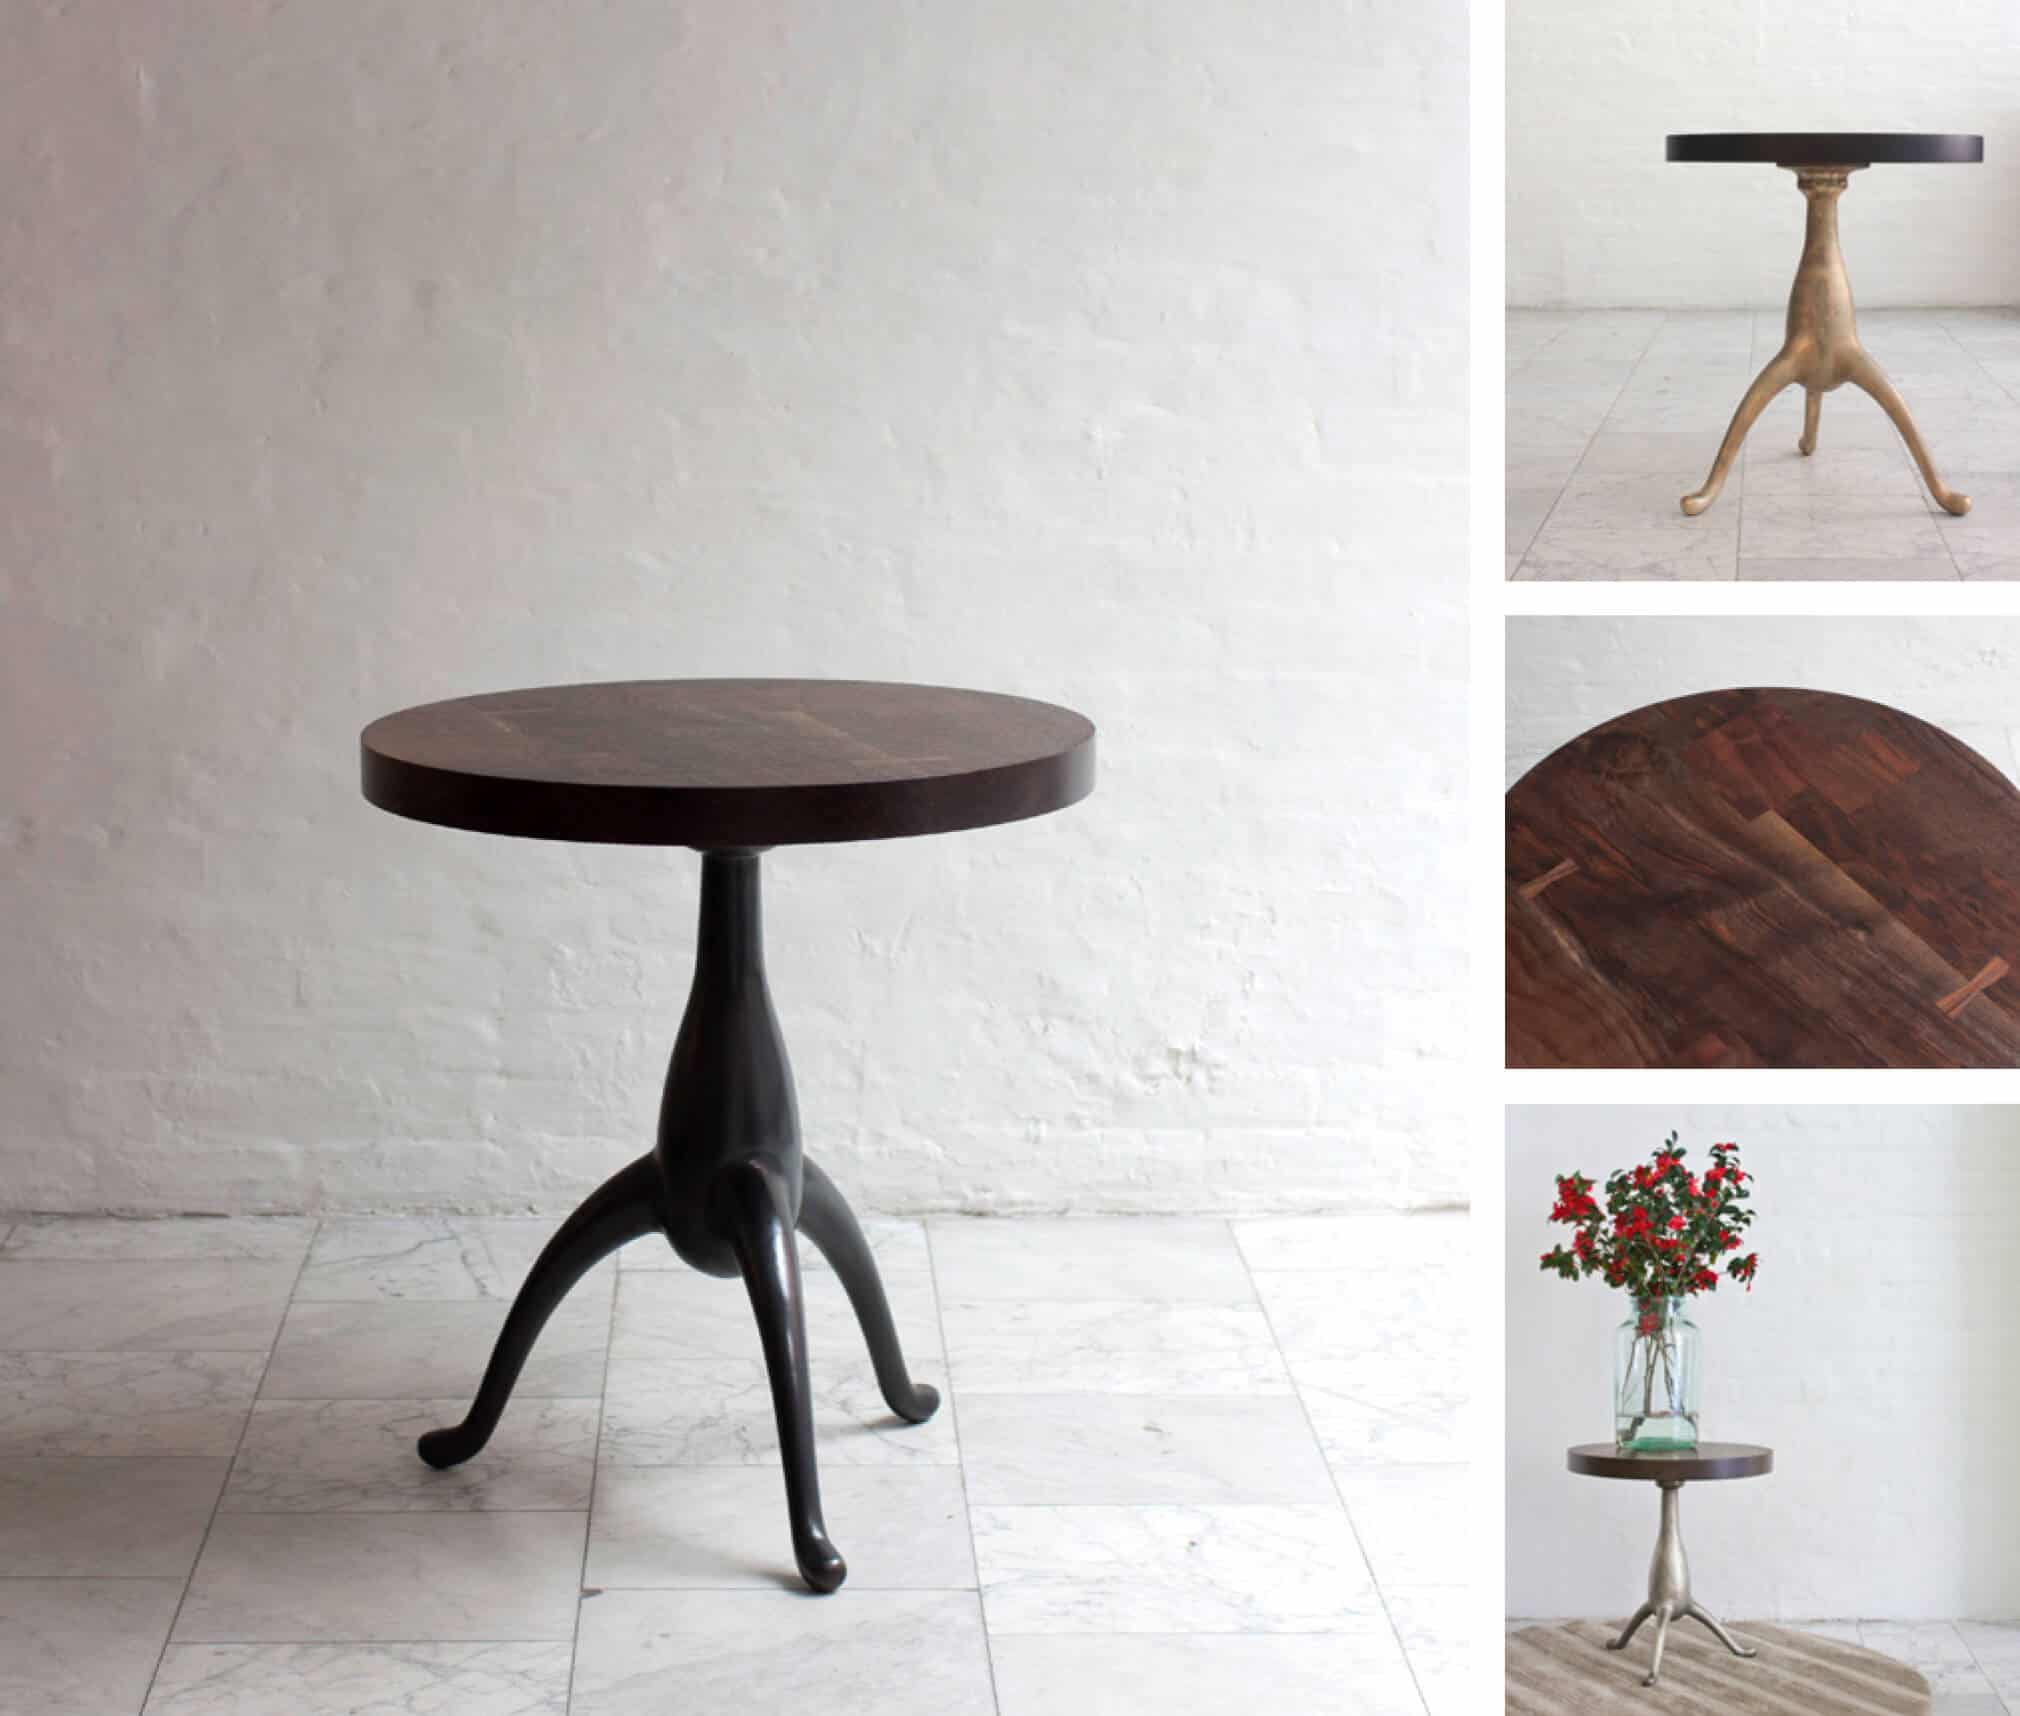 emily henderson_furniture_bddw-side table